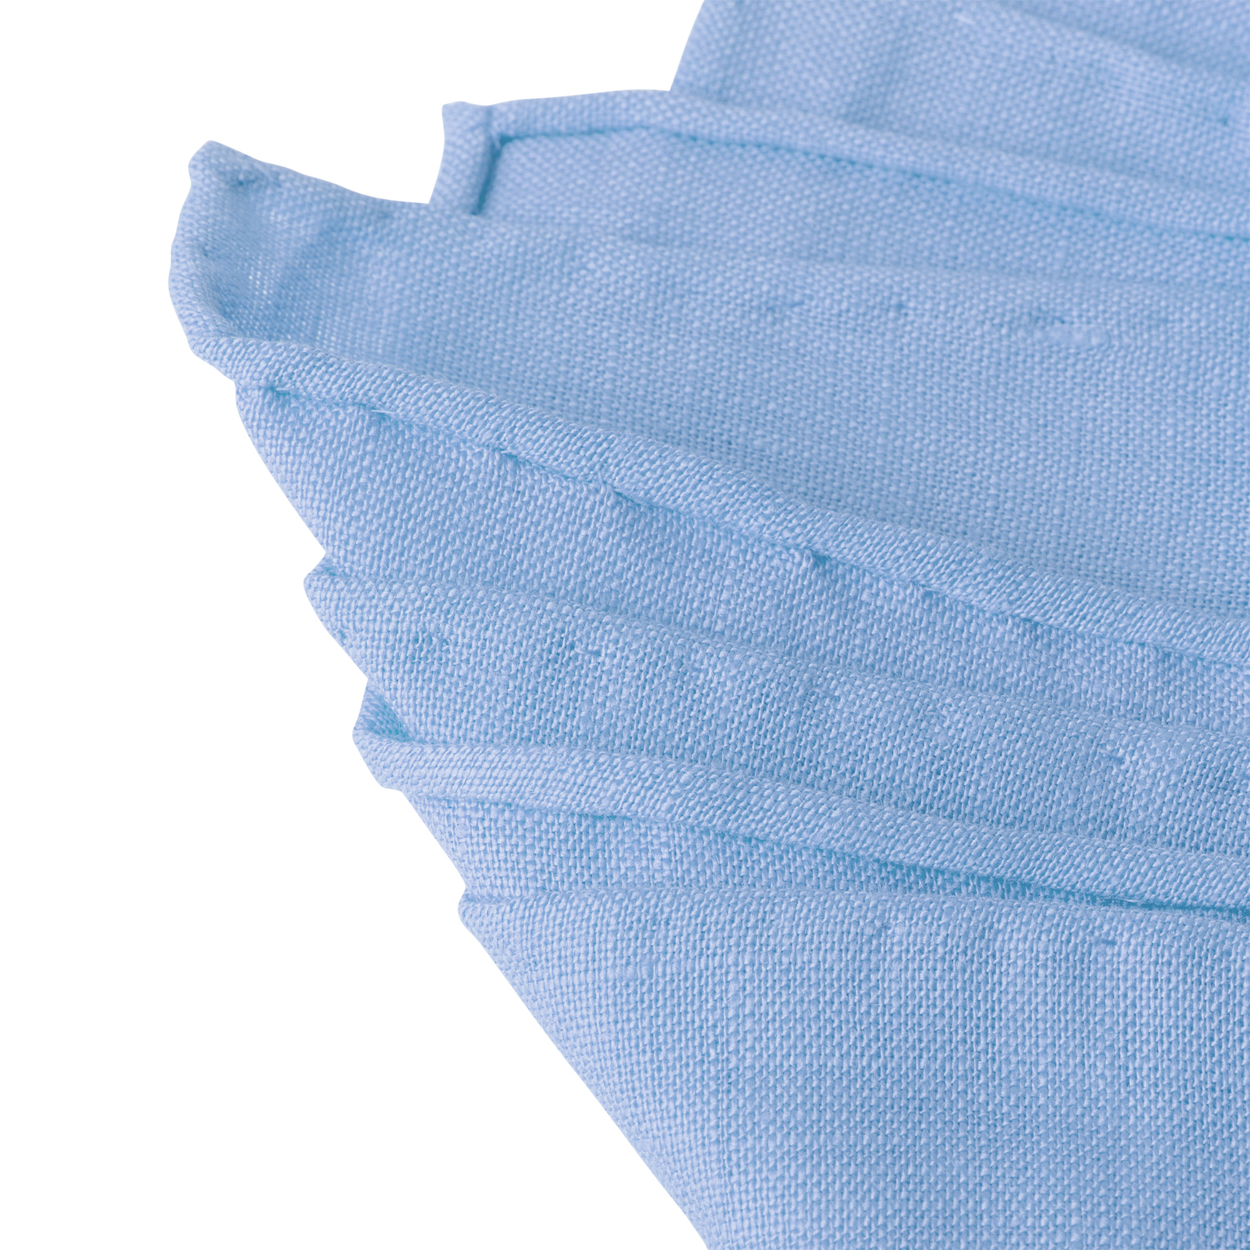 Jacob-Alexander-Linen-Handrolled-15-034-x-15-034-Pocket-Square-Hanky thumbnail 33